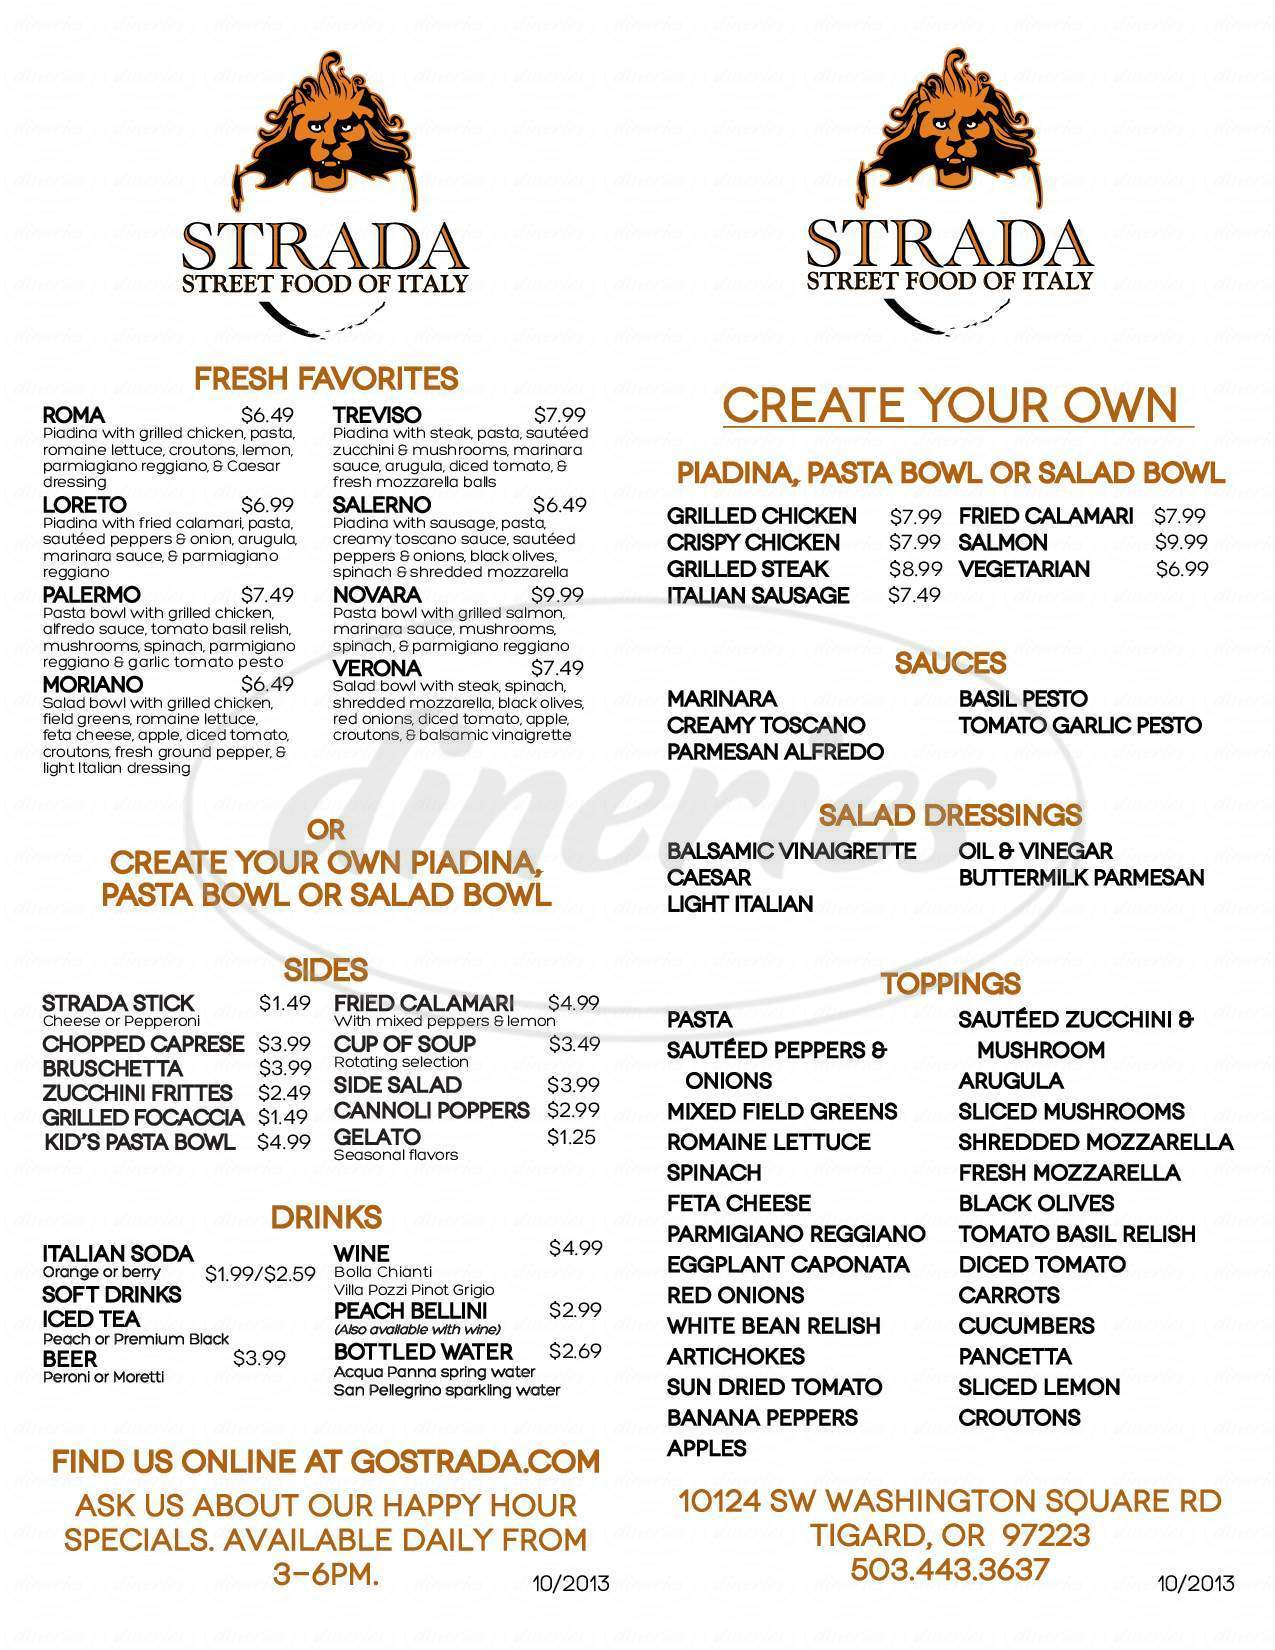 menu for Strada: Street Food of Italy